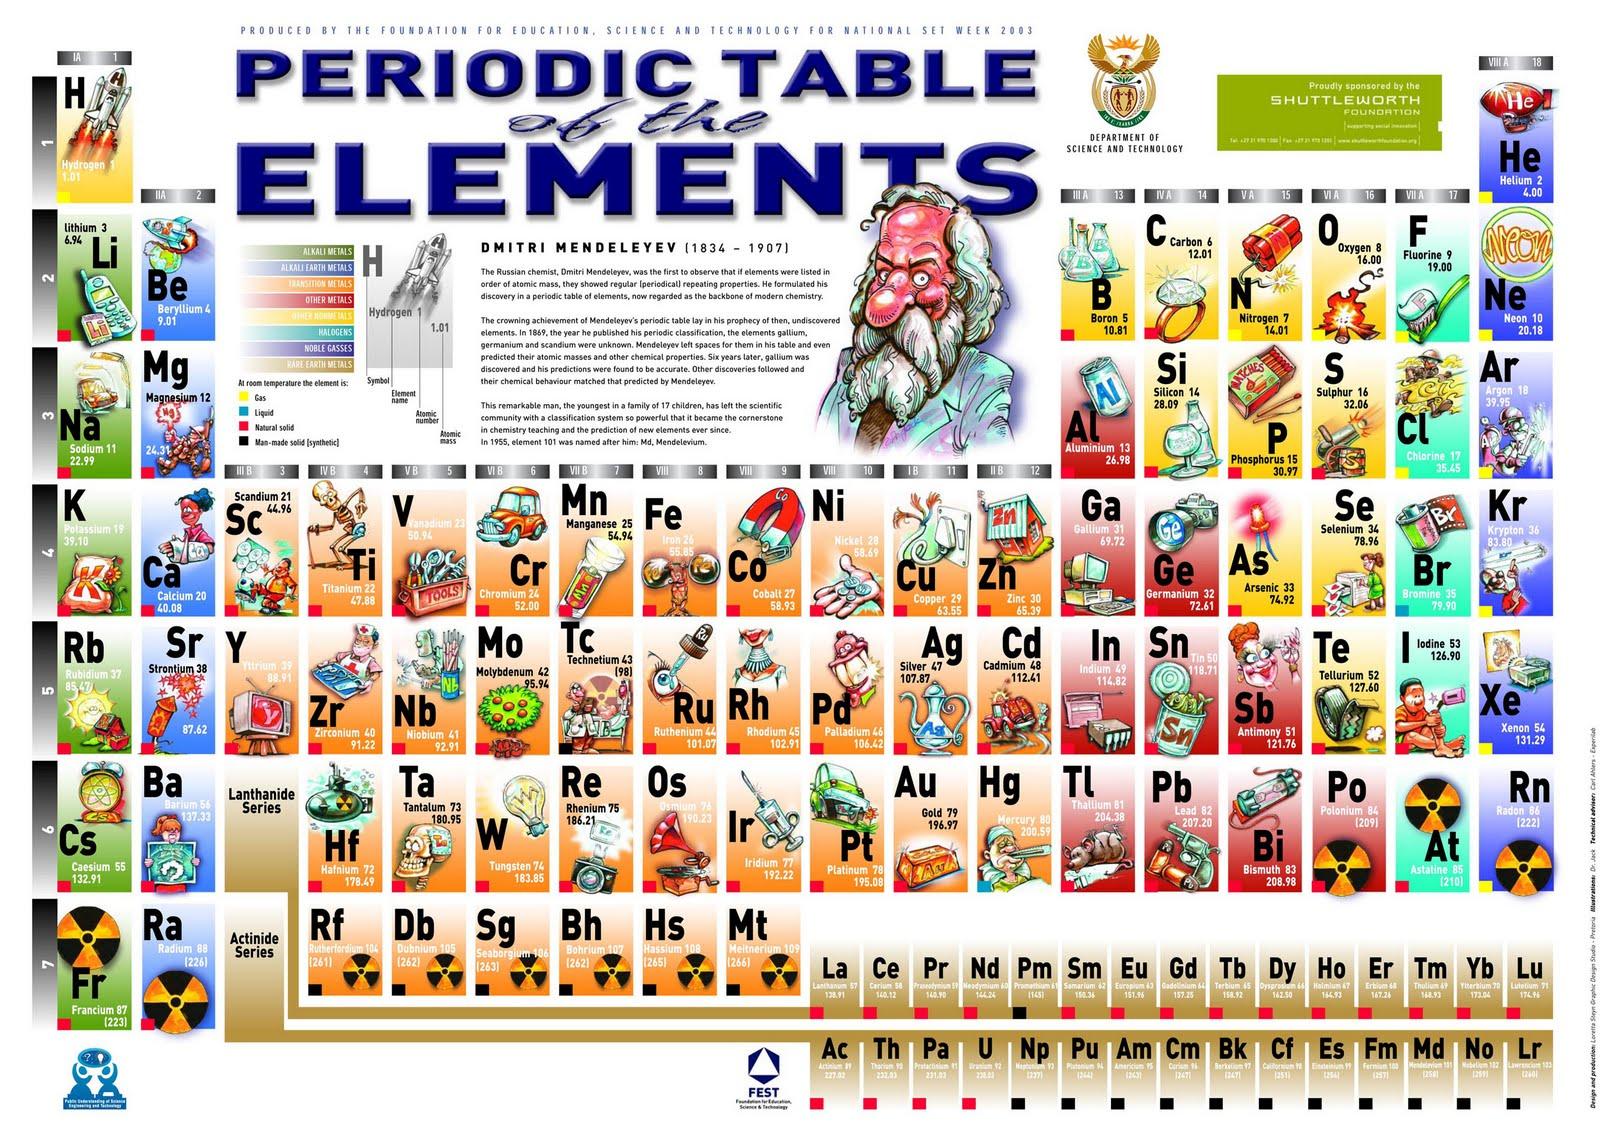 Kimia tabel periodik berikut adalah daftar unsur kimia diurutkan berdasarkan nama dan warna menunjukkan jenis unsur pada masing masing unsur meliputi lambang unsur urtaz Images